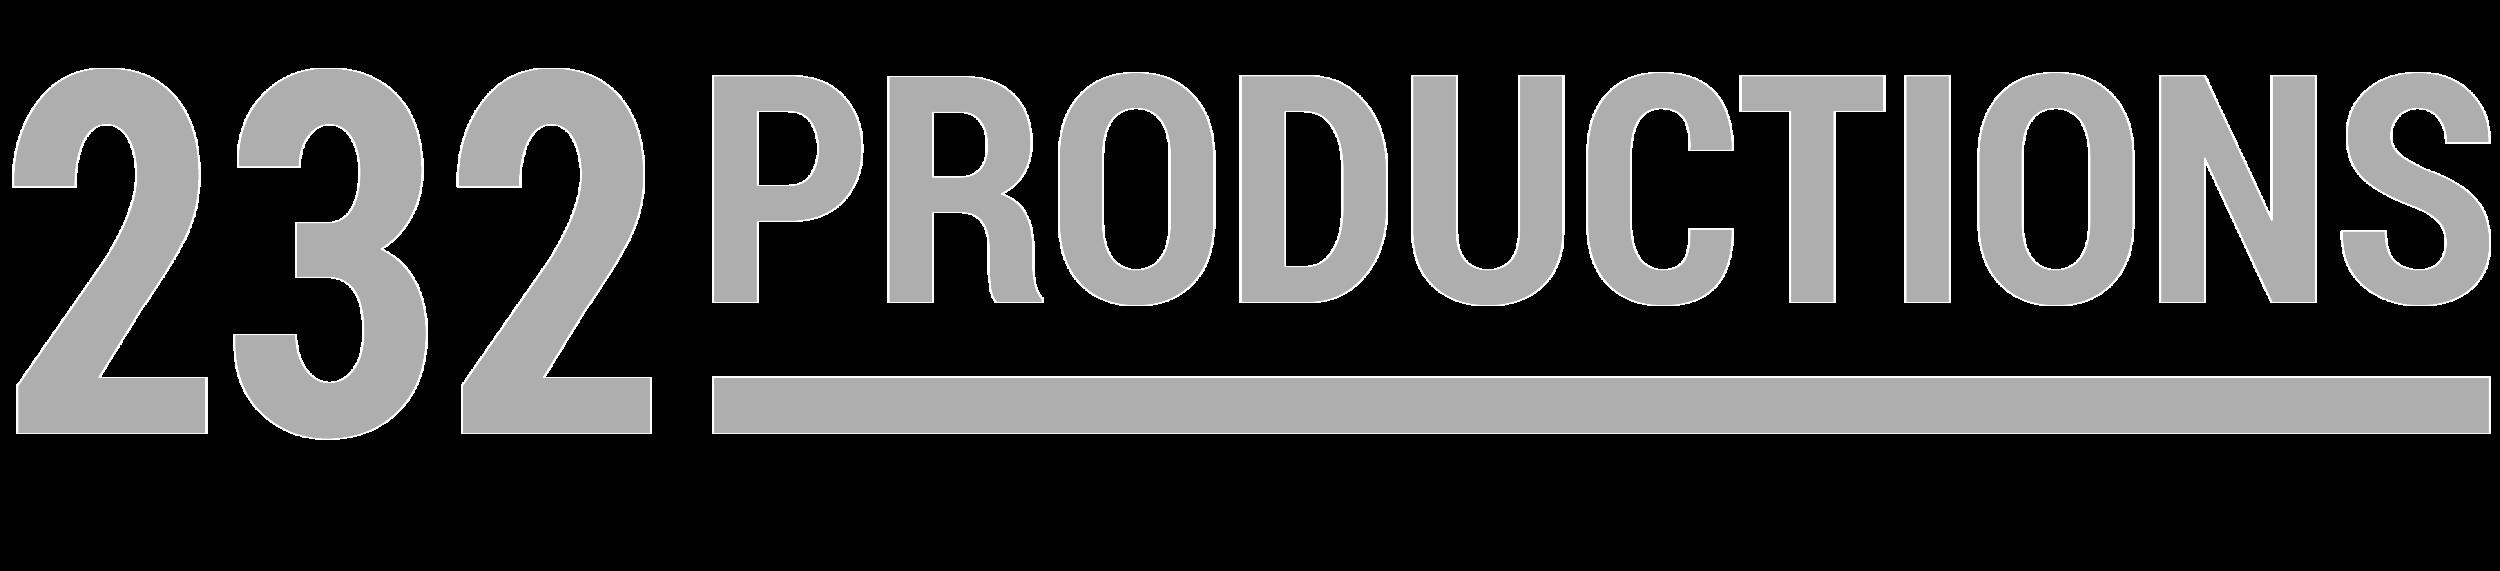 232 Productions Logo - White [transparent].png